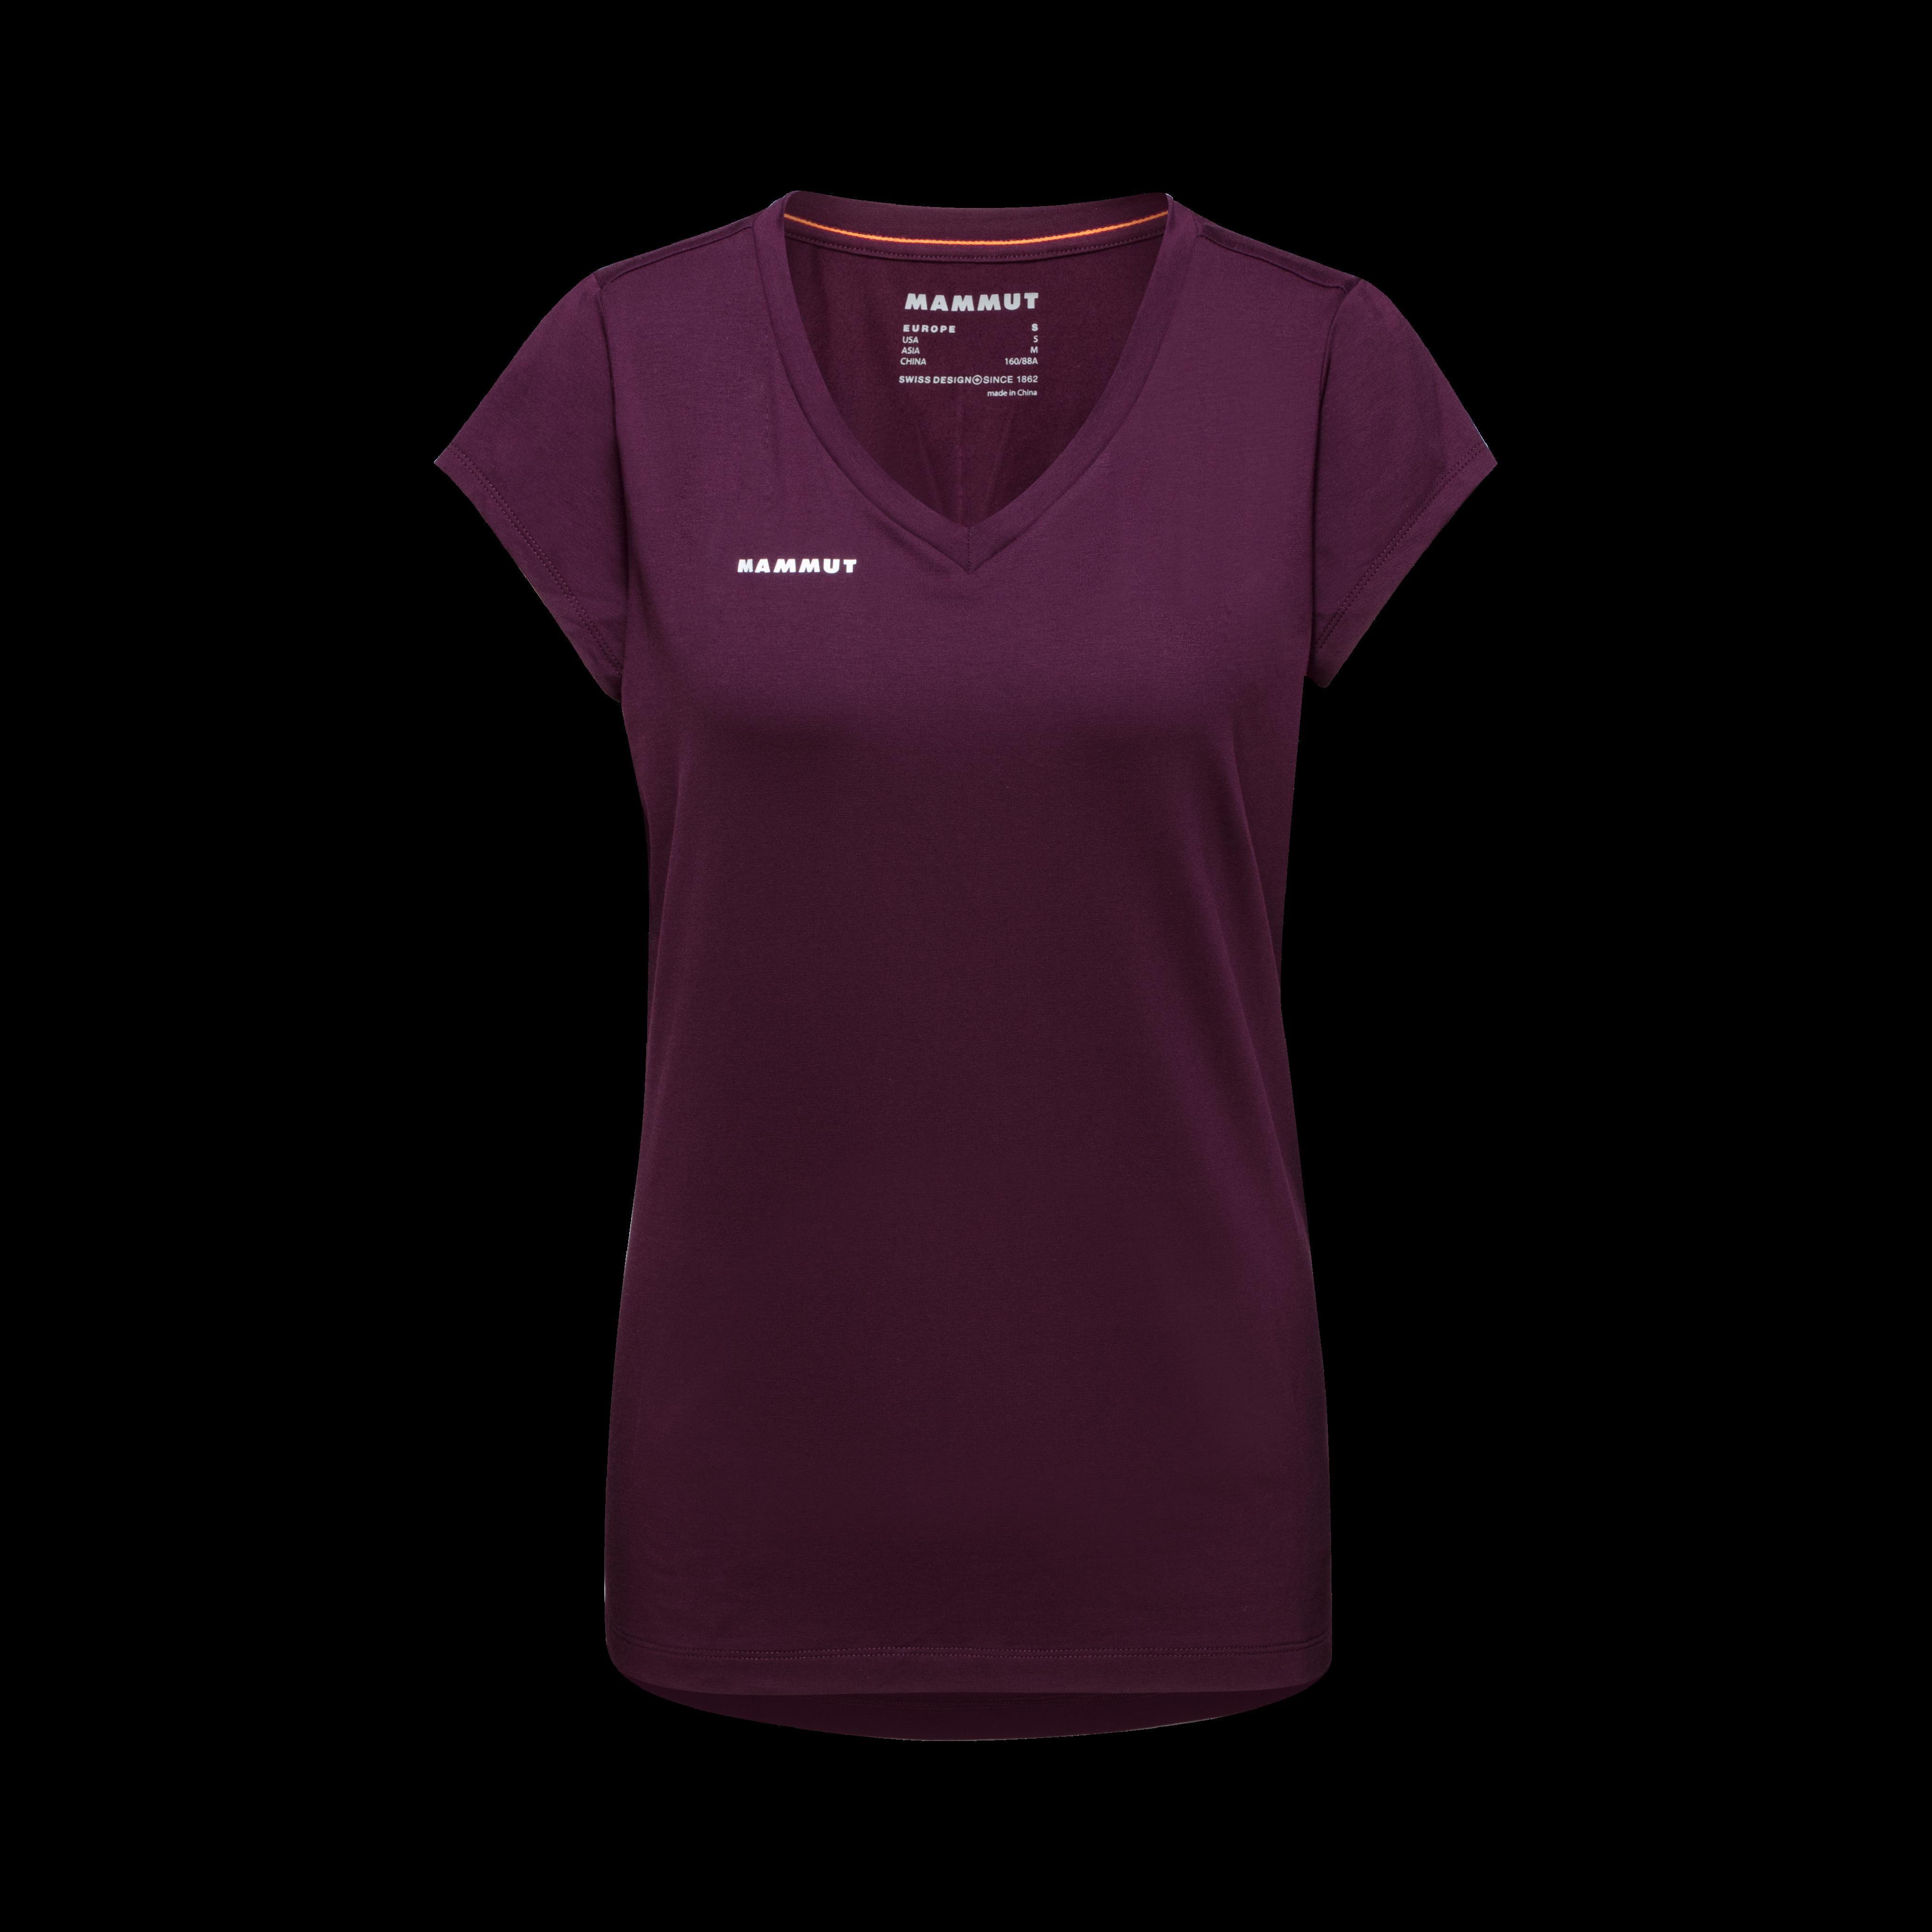 Massone T-Shirt Women - grape PRT3, M thumbnail